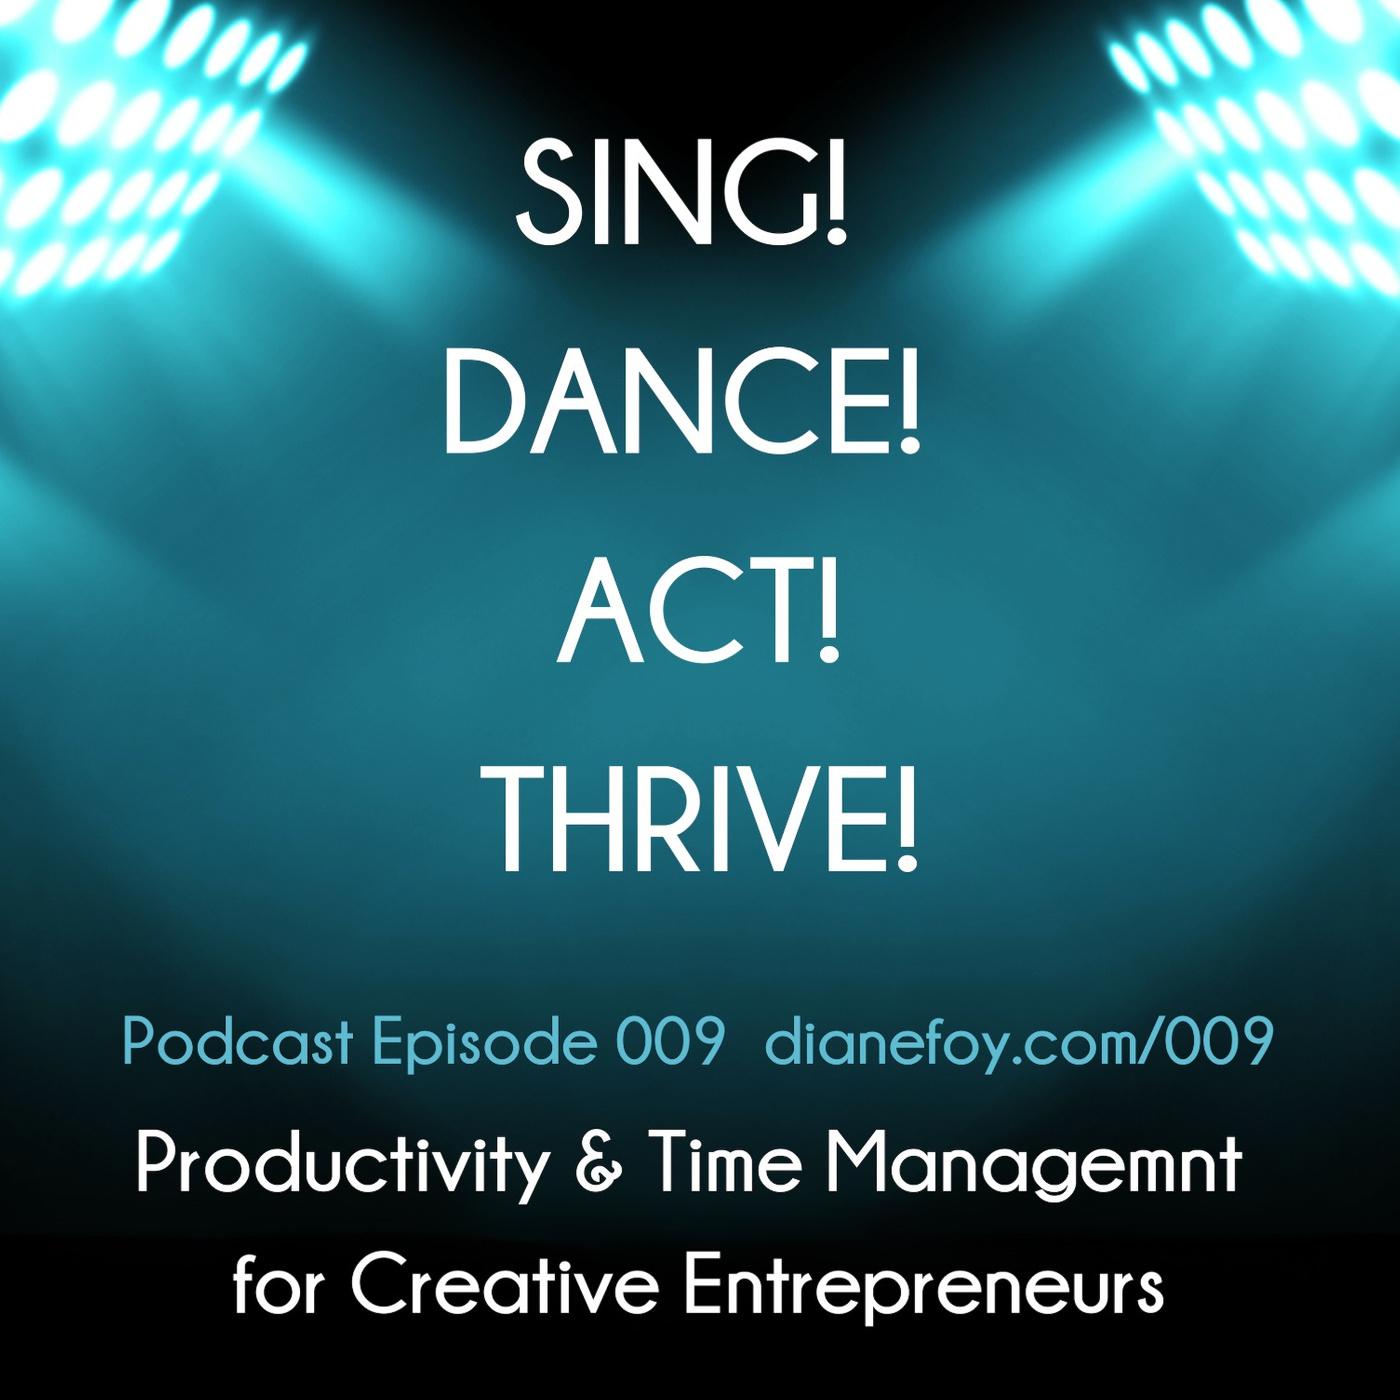 Productivity & Time Management for Creative Entrepreneurs